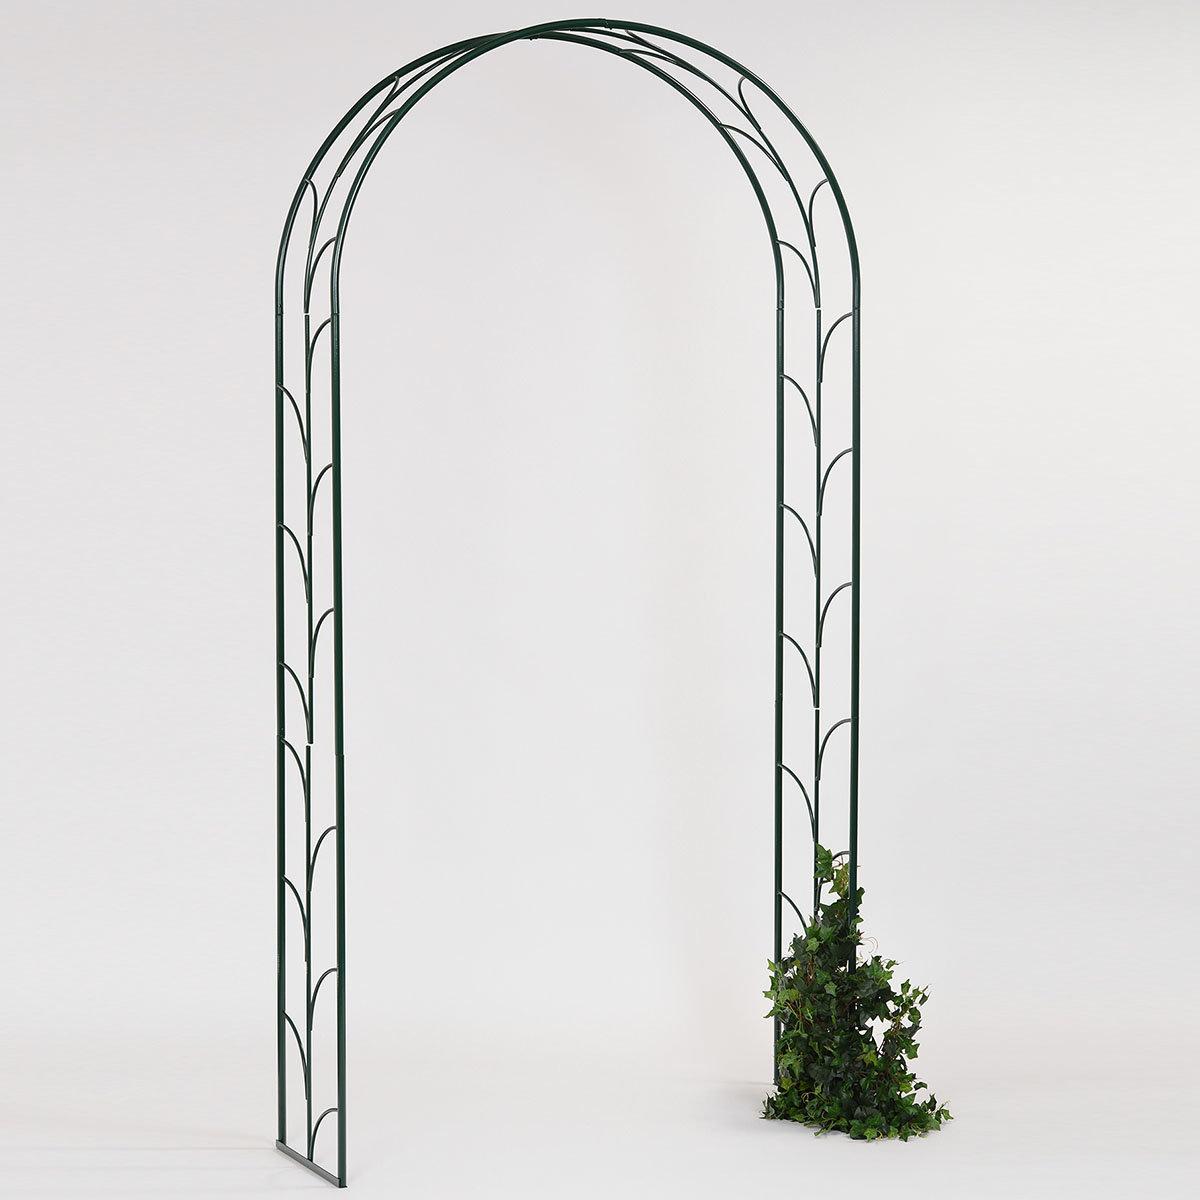 Rosenbogen Liane, oxford-grün | #3